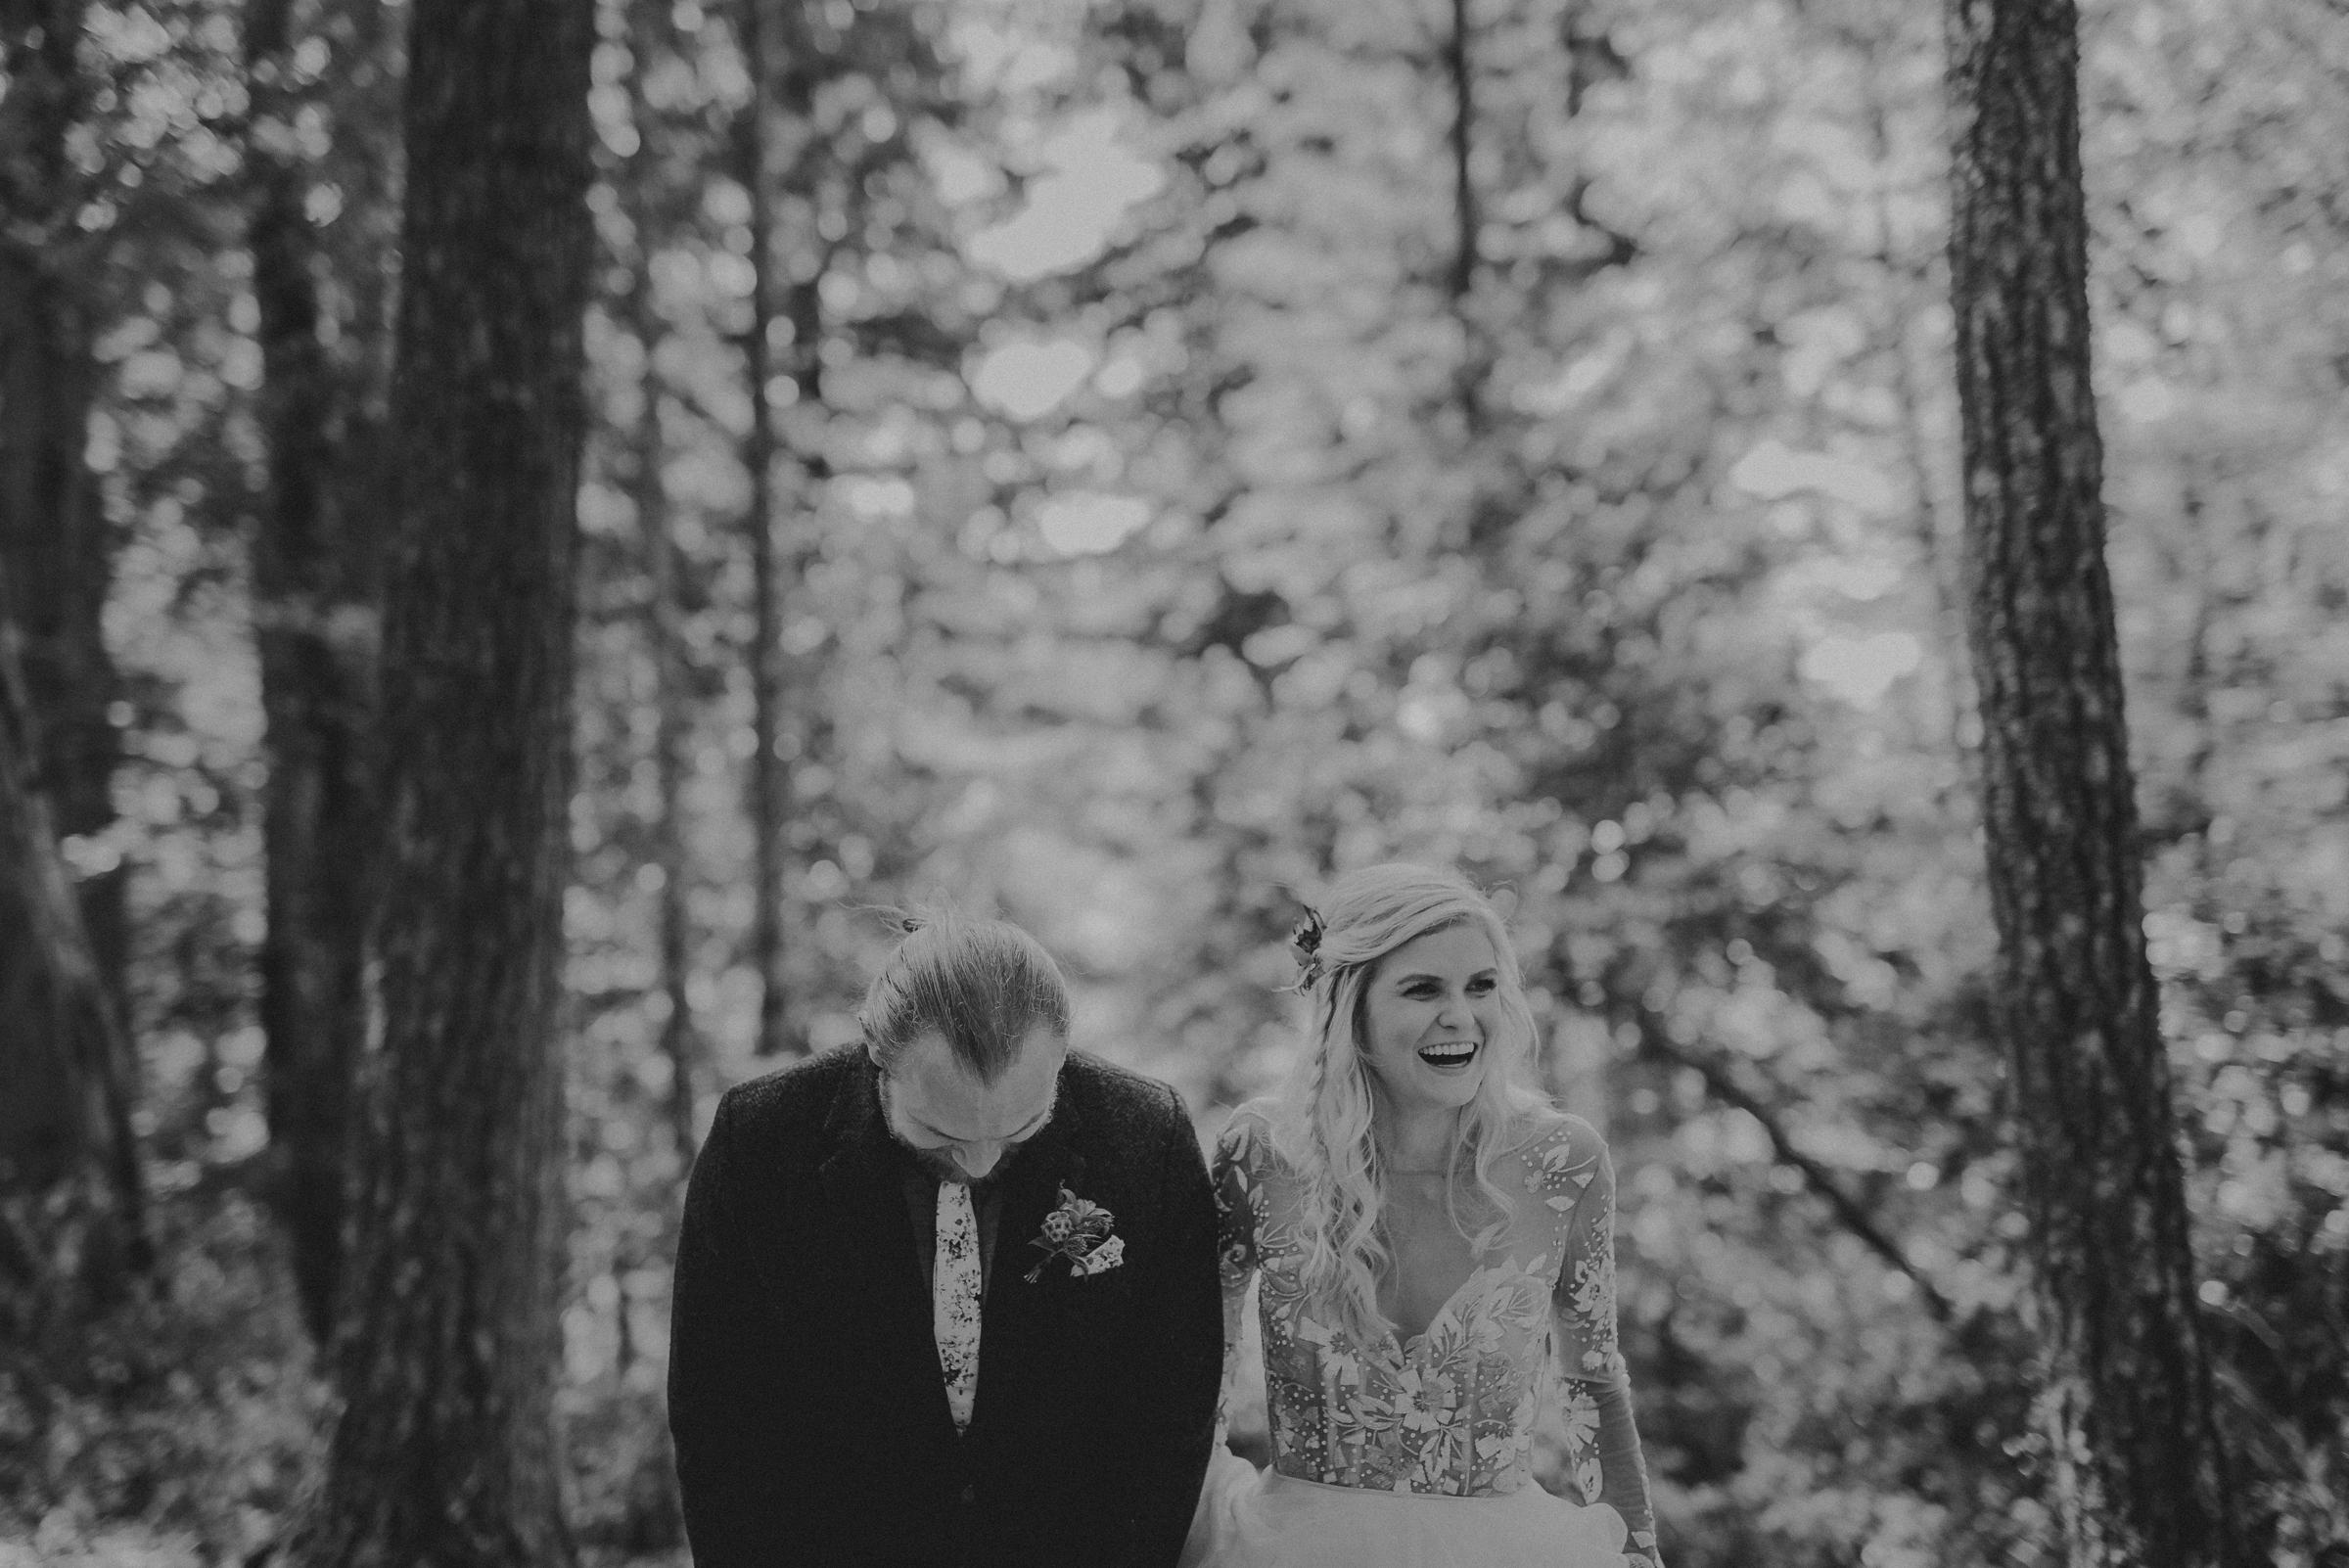 IsaiahAndTaylor.com - California Destination Elopement, Lake Leonard Reserve Wedding, Ukiah-066.jpg